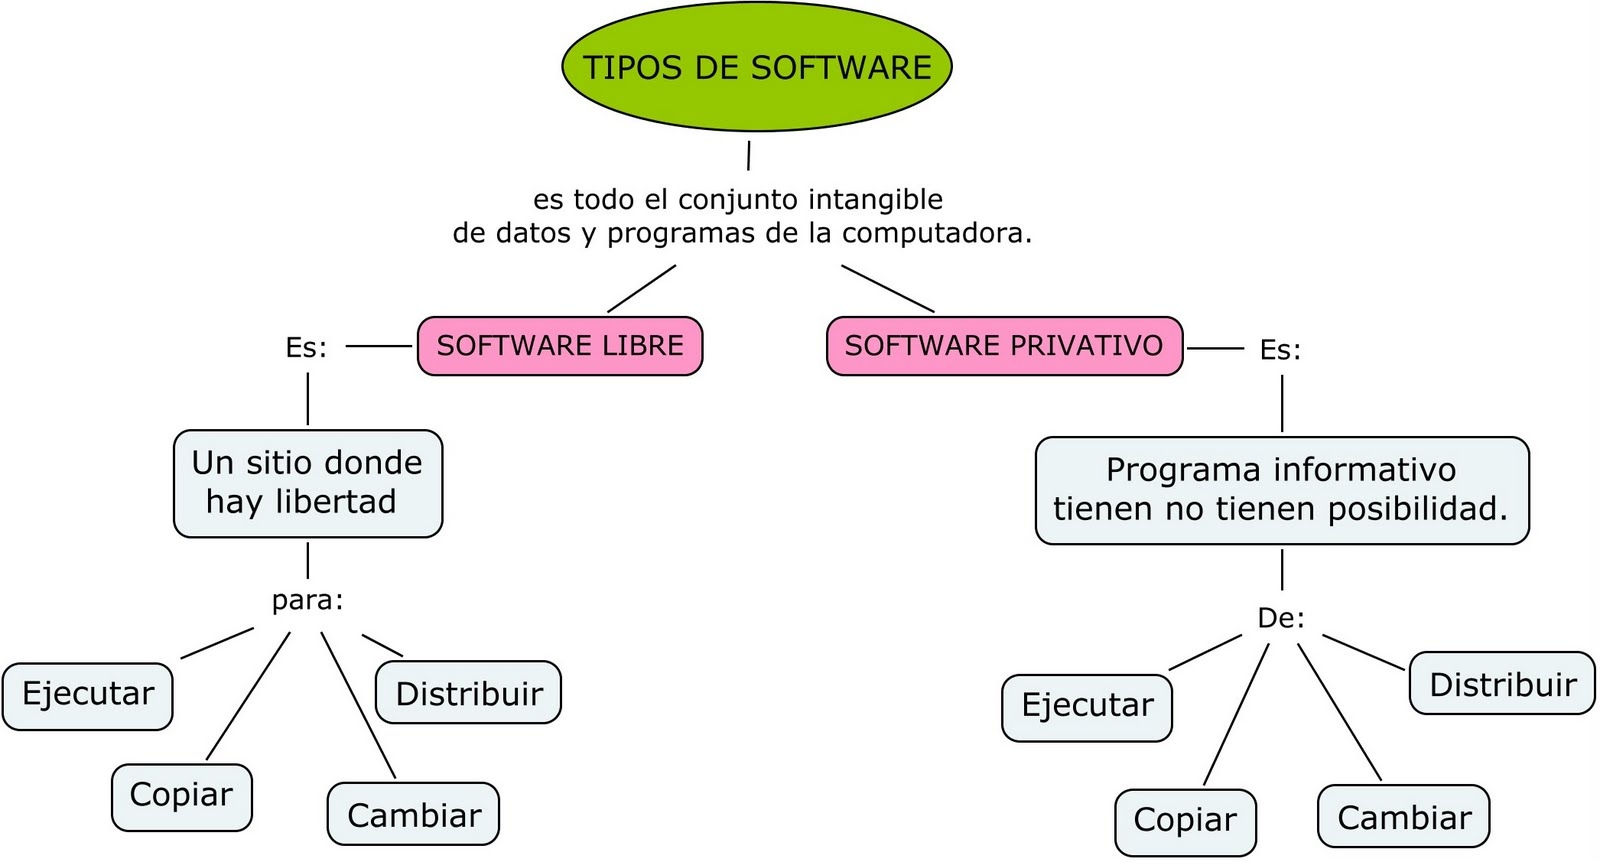 Software Privativo vrs Software Libre